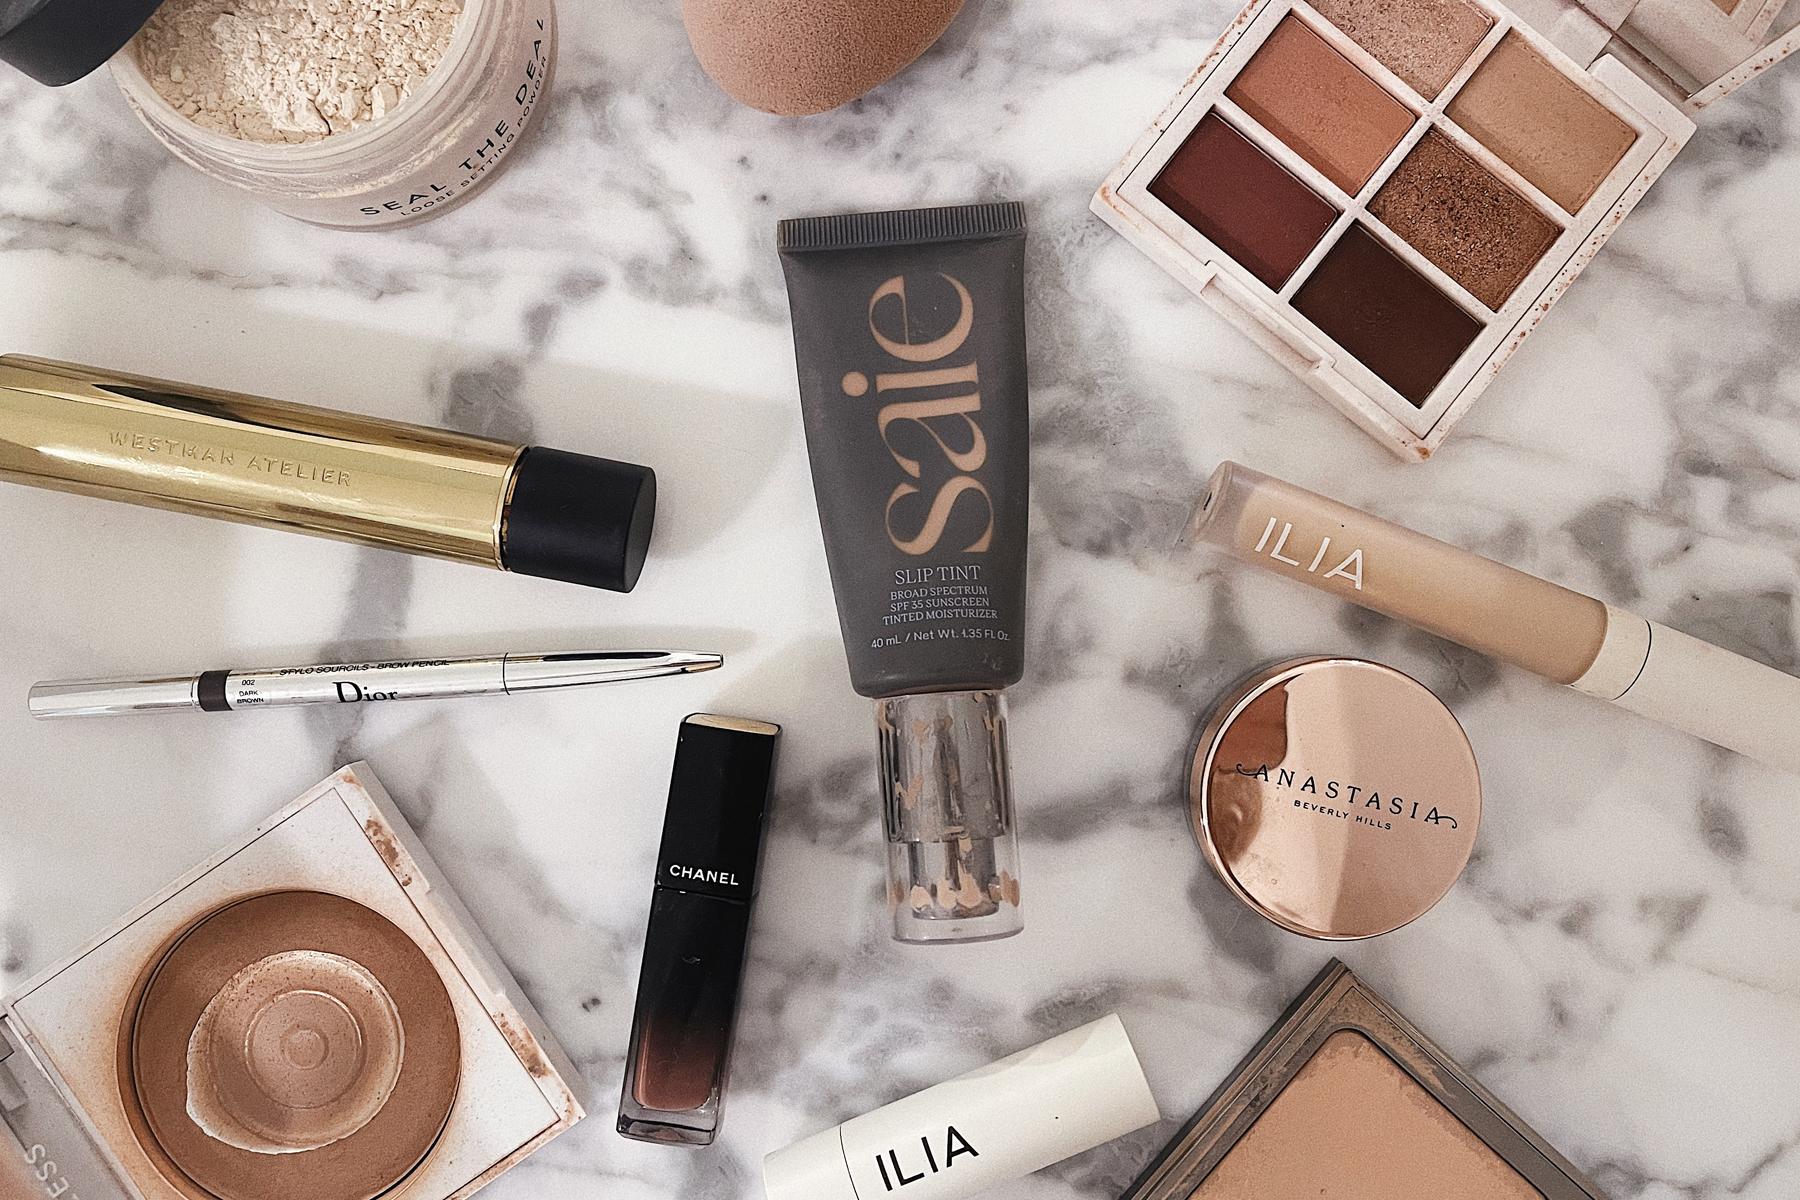 Fashion-Jackson-5-Min-Makeup-Routine-products